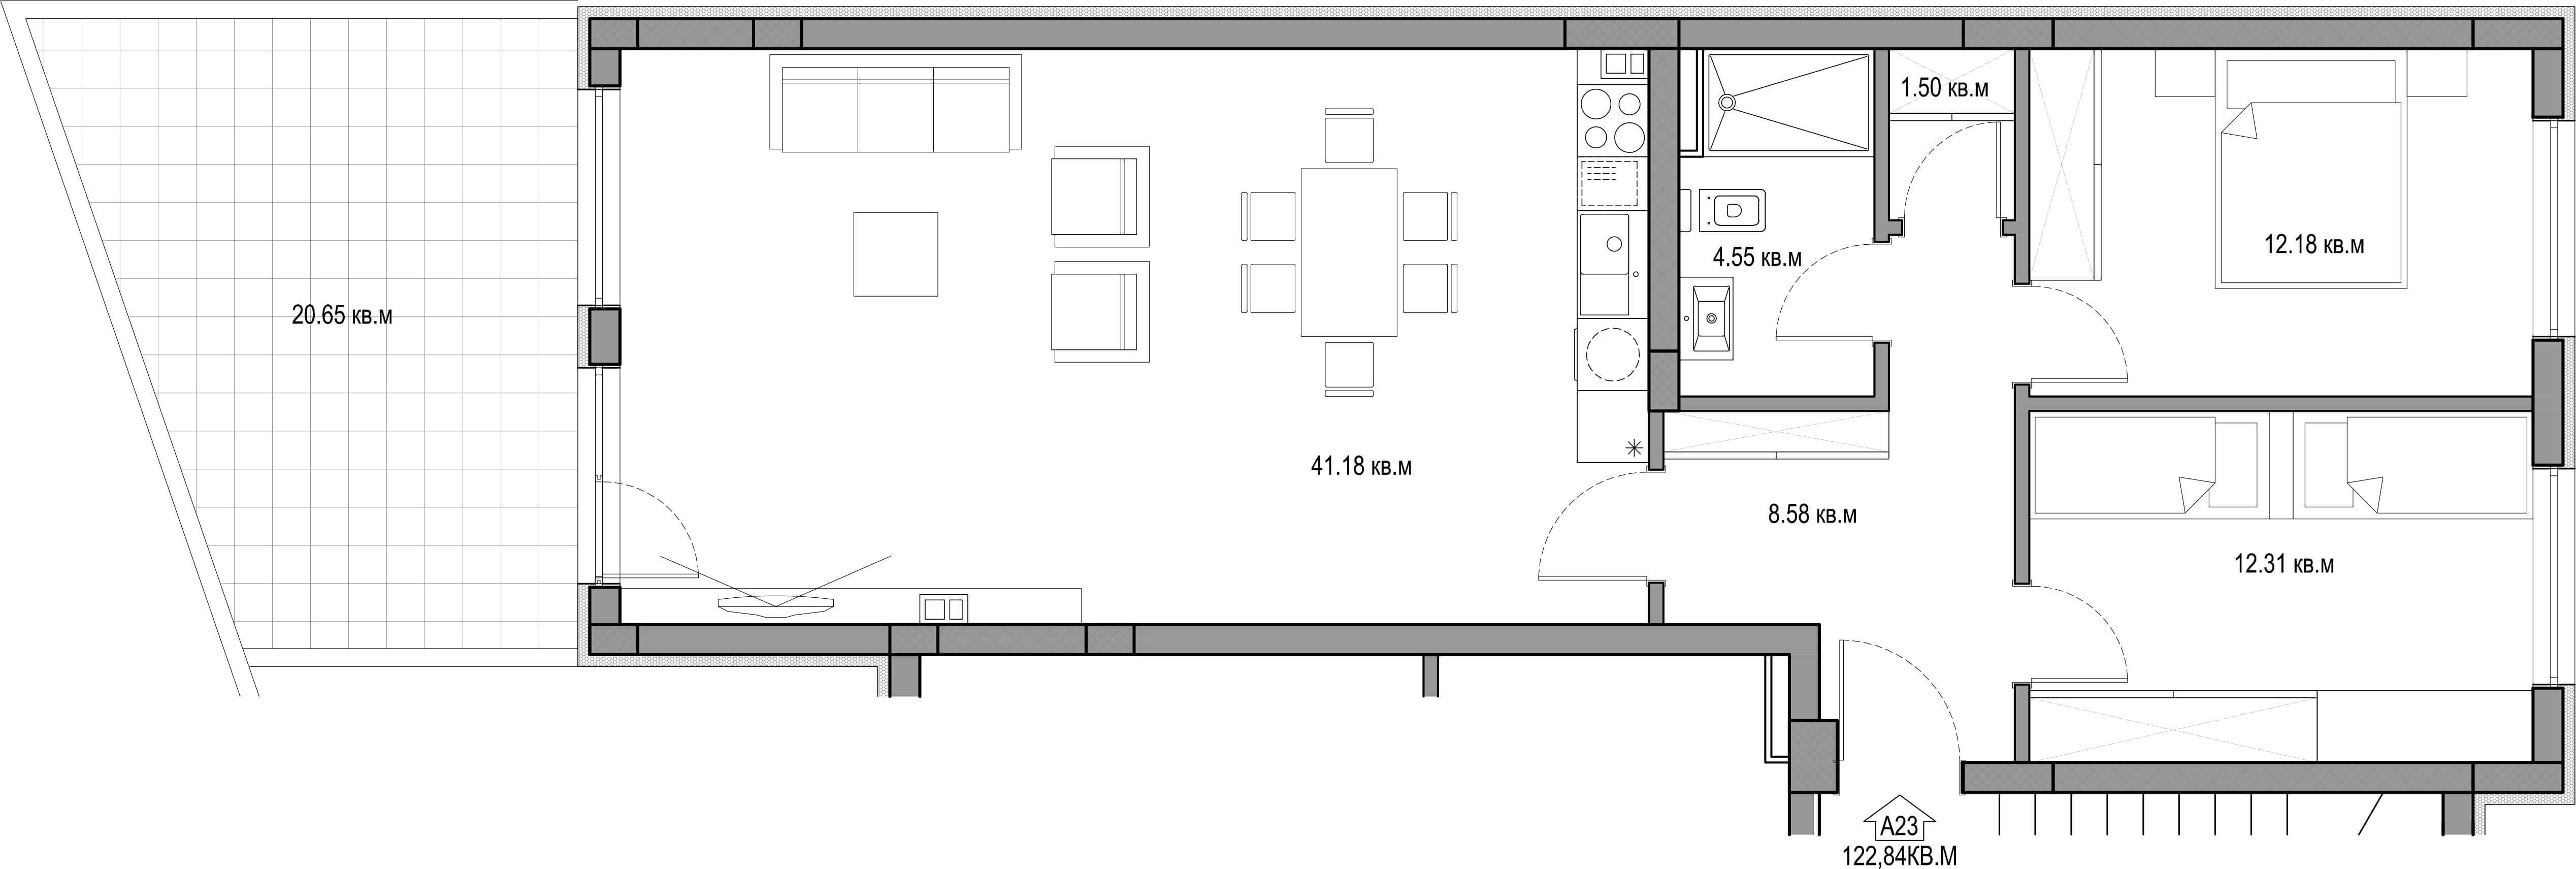 Vinitsa_Apartment_2_23